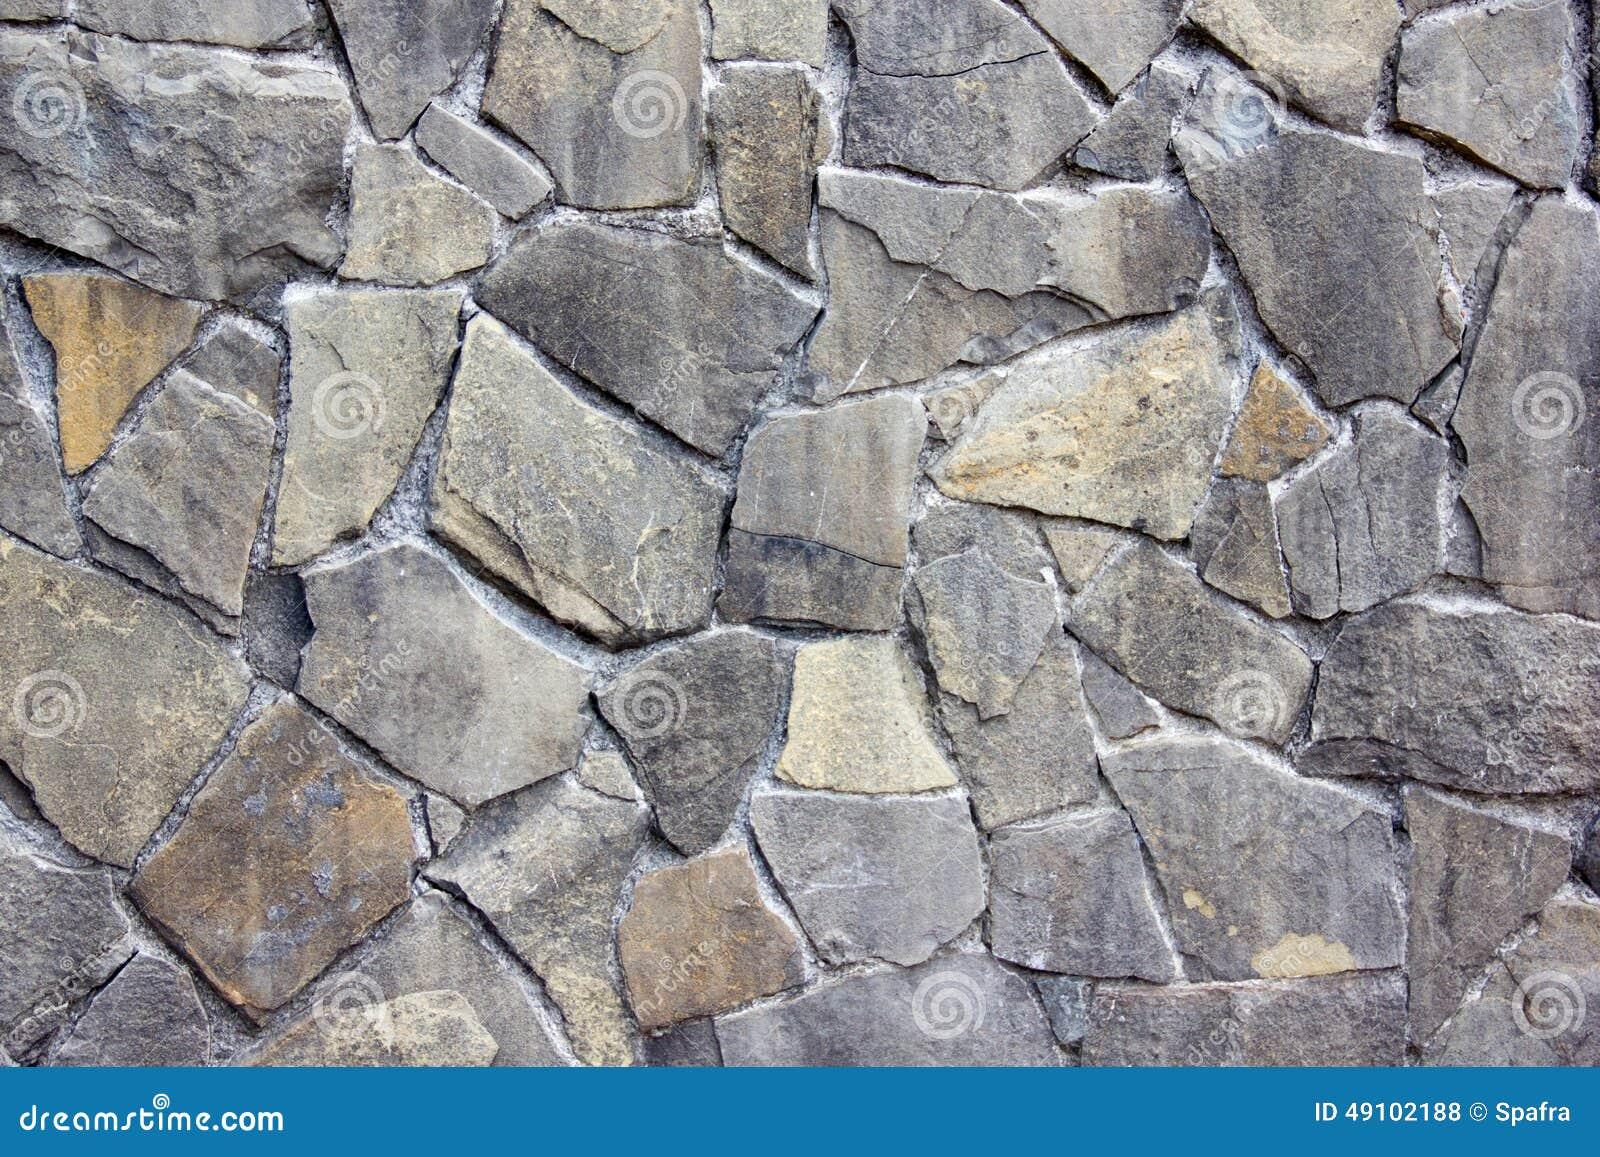 Gray stone walls